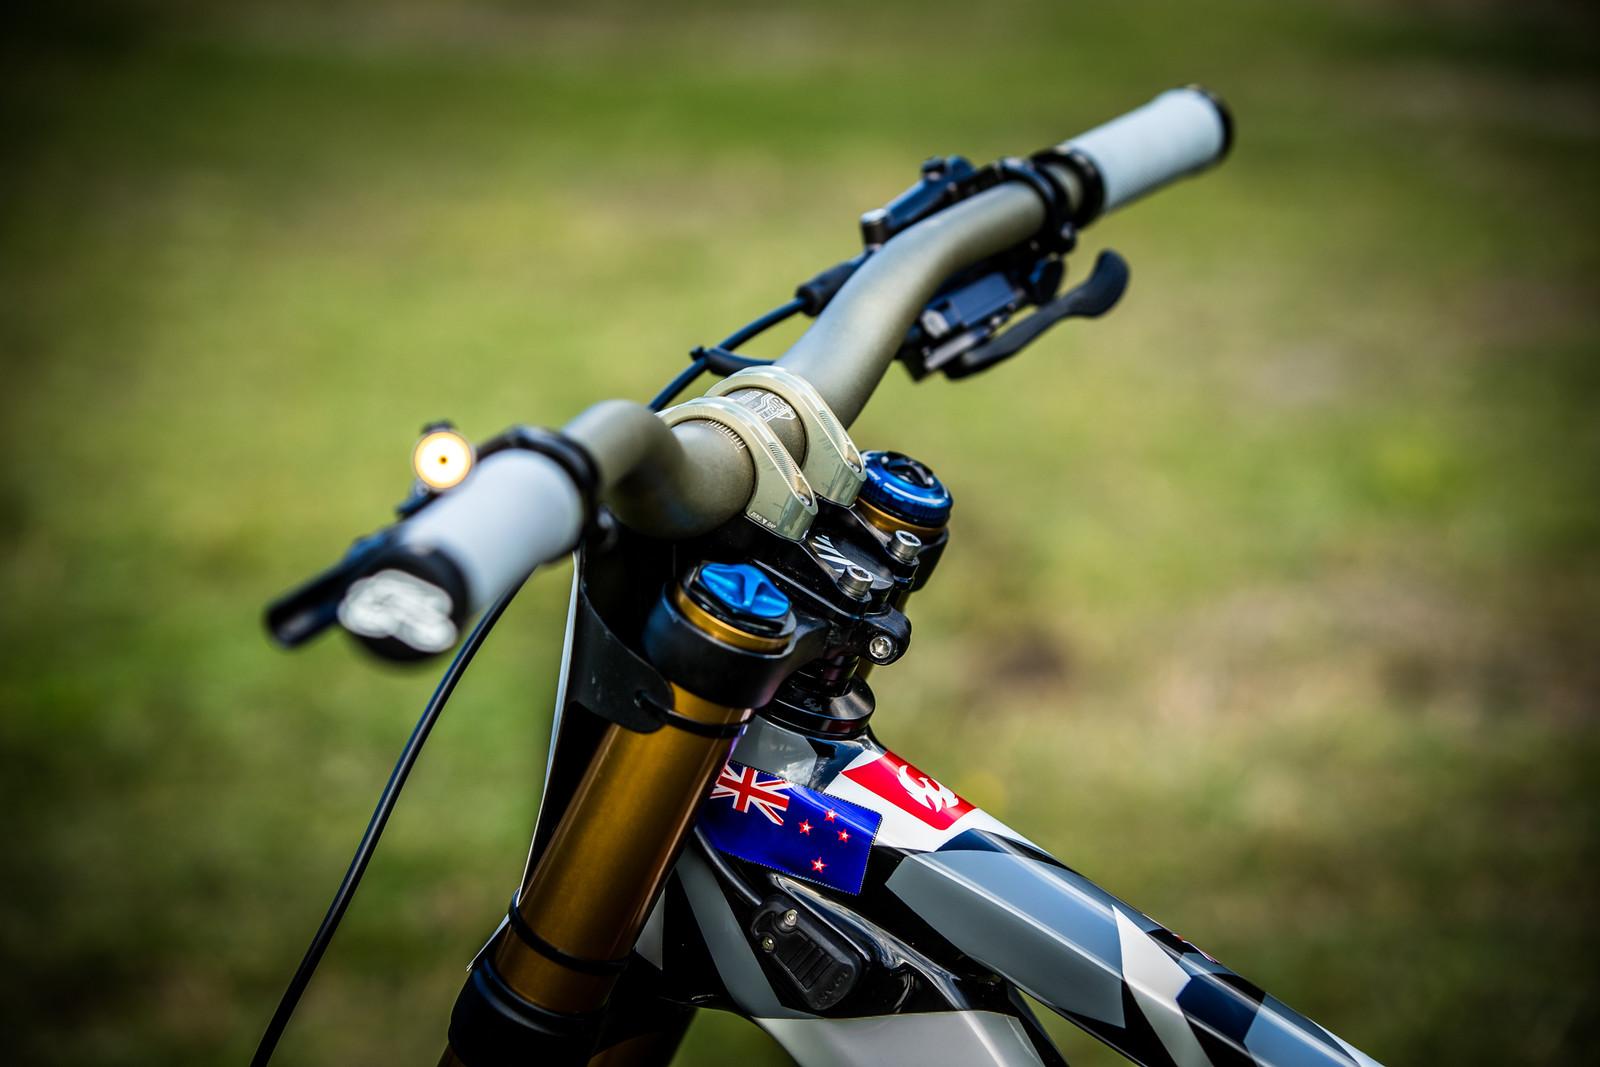 Renthal Cockpit - WORLD CHAMPS BIKE - Eddie Masters' Pivot Phoenix - Mountain Biking Pictures - Vital MTB